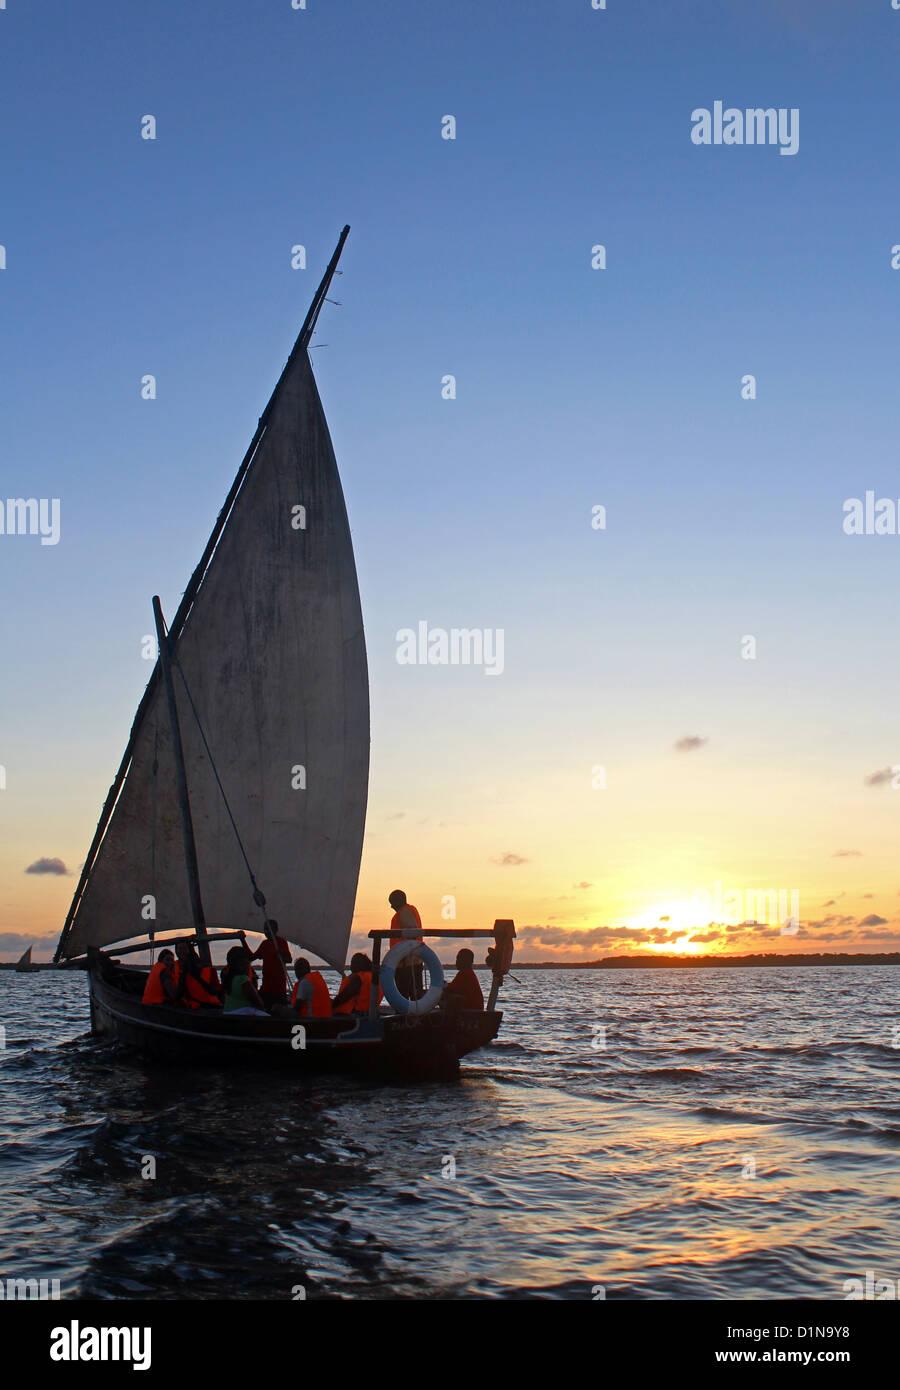 Tourists enjoy a boat trip, Kenya, East Africa - Stock Image